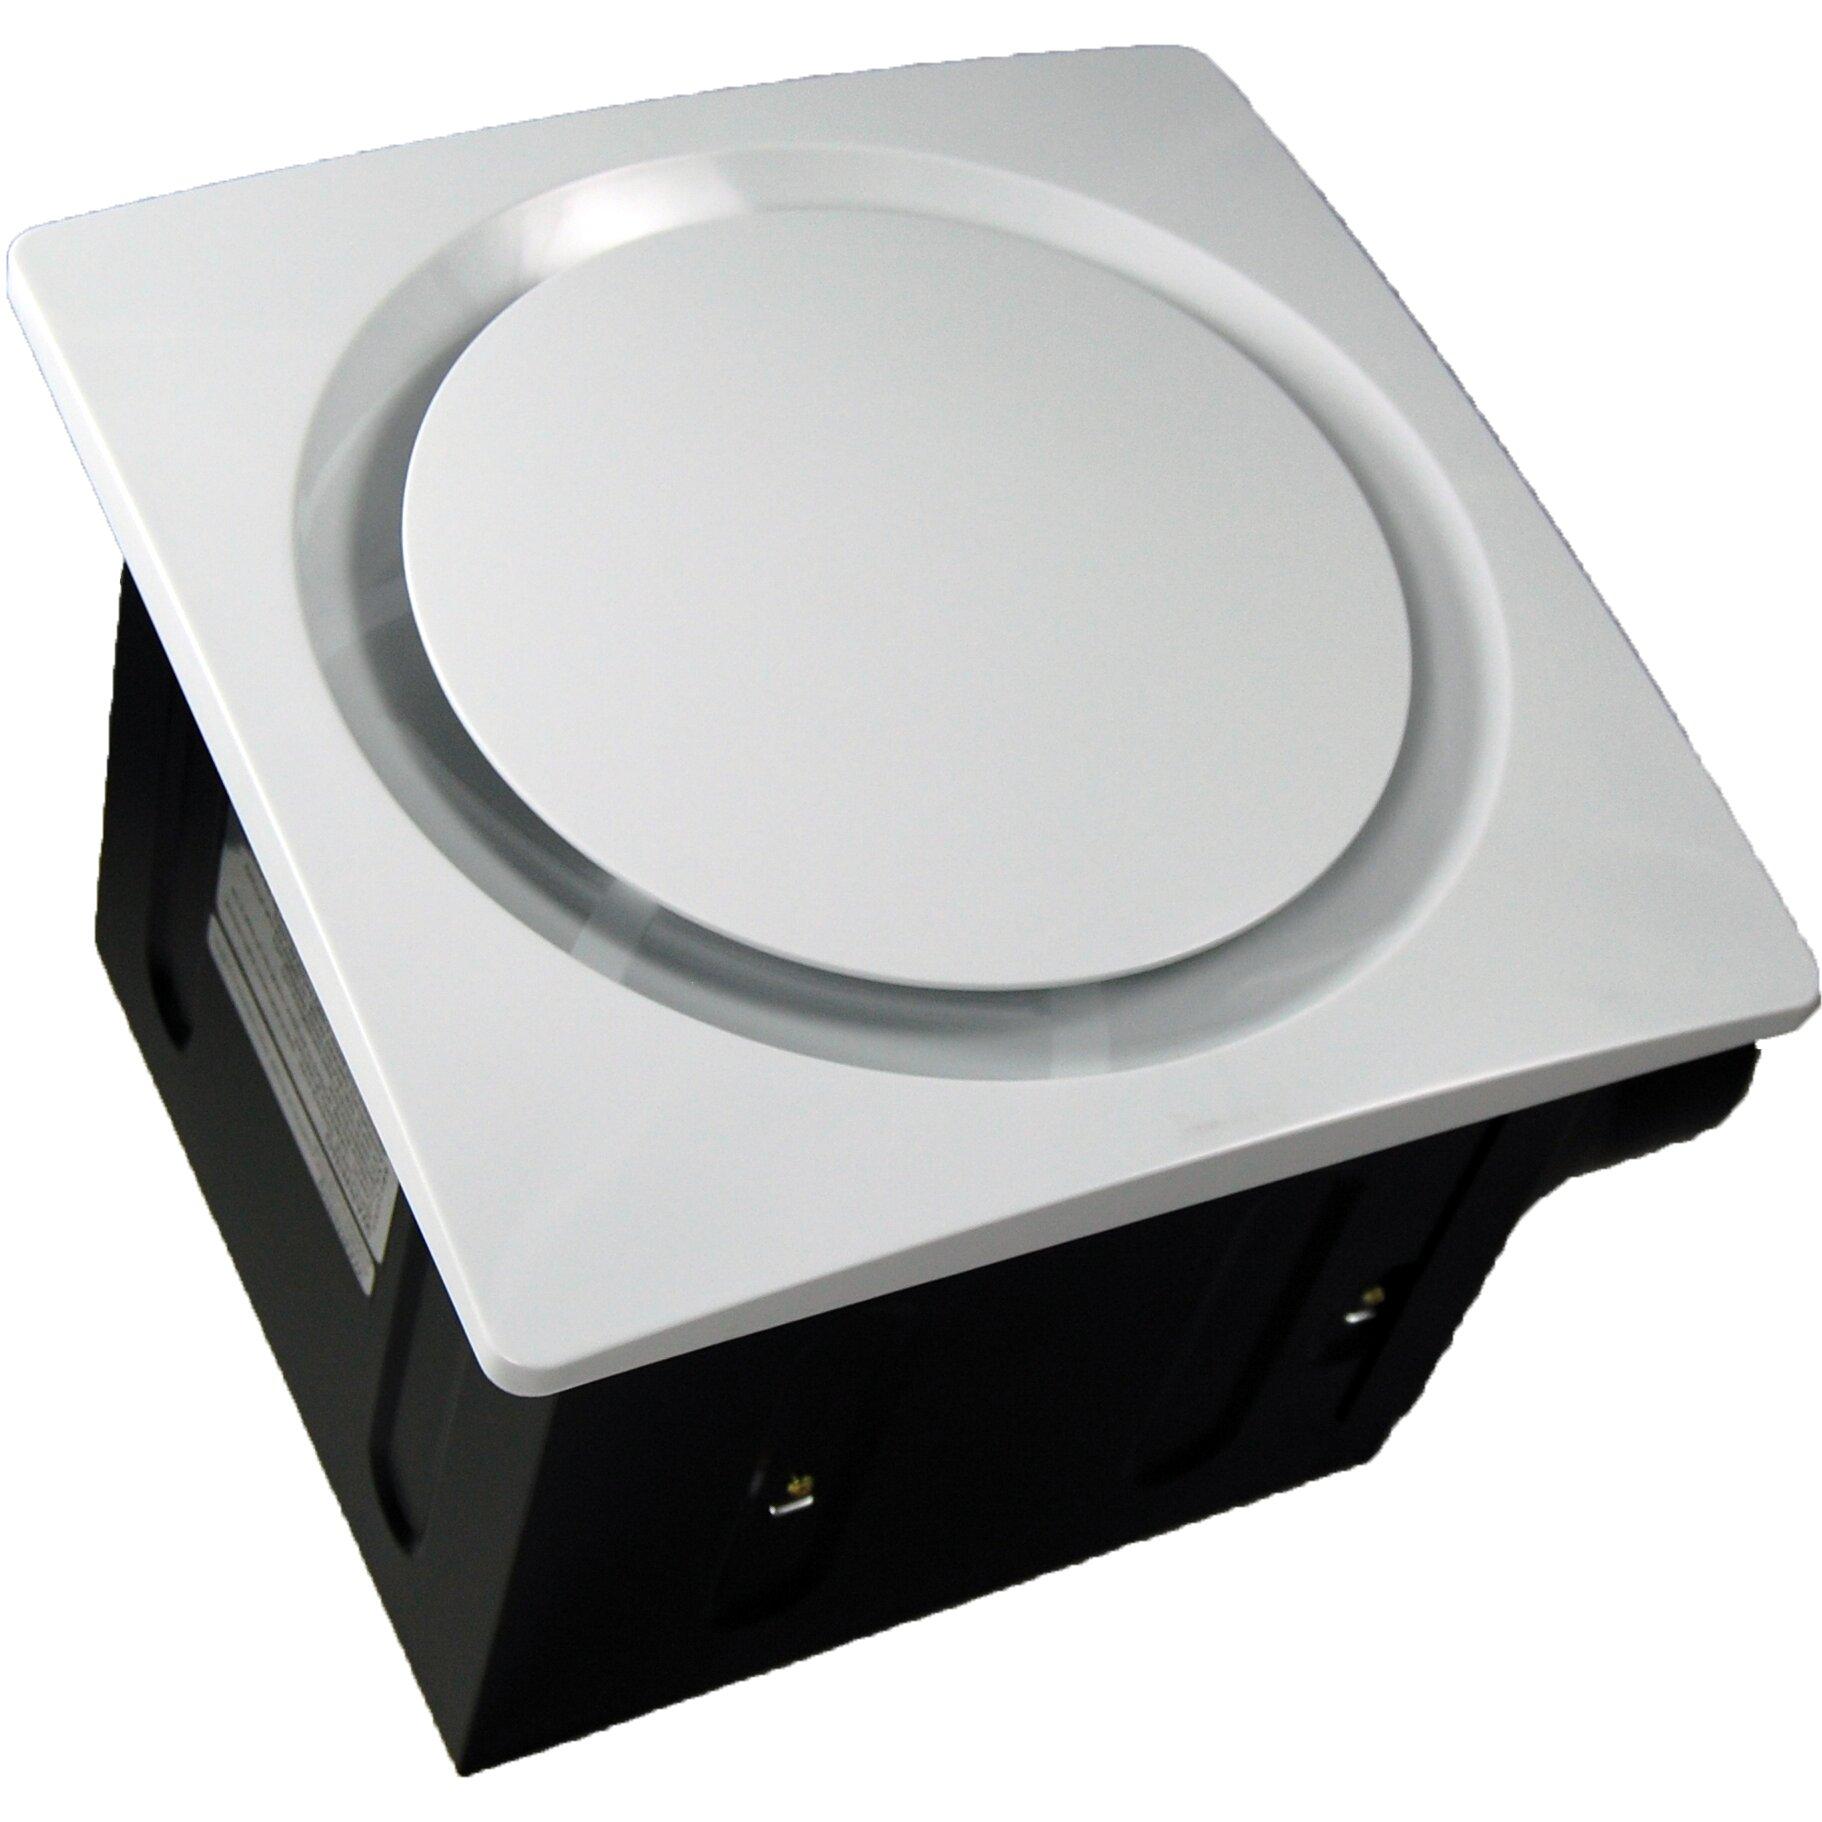 Quietest bathroom fan reviews - Super Quiet 110 Cfm Bathroom Ventilation Fan